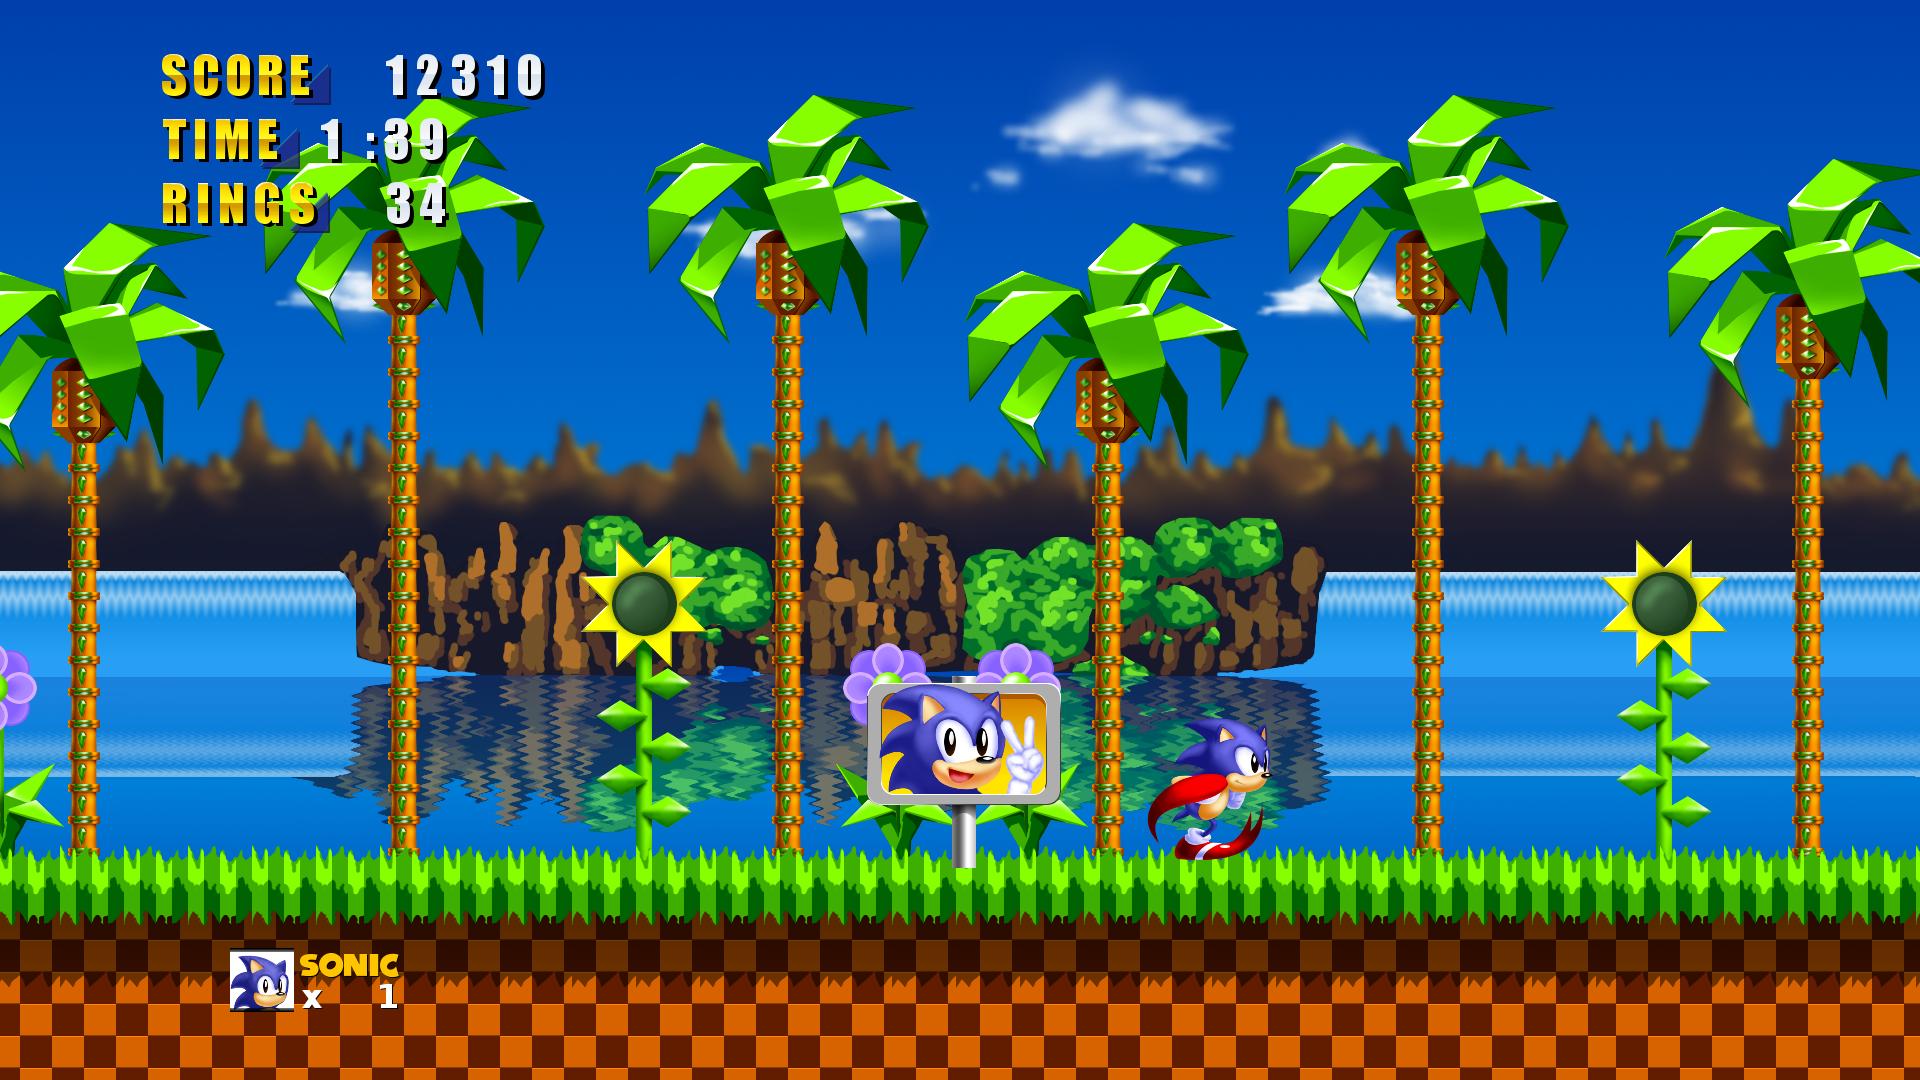 Sonic 1 Hd Green Hill Zone By Hyperchaotix On Deviantart